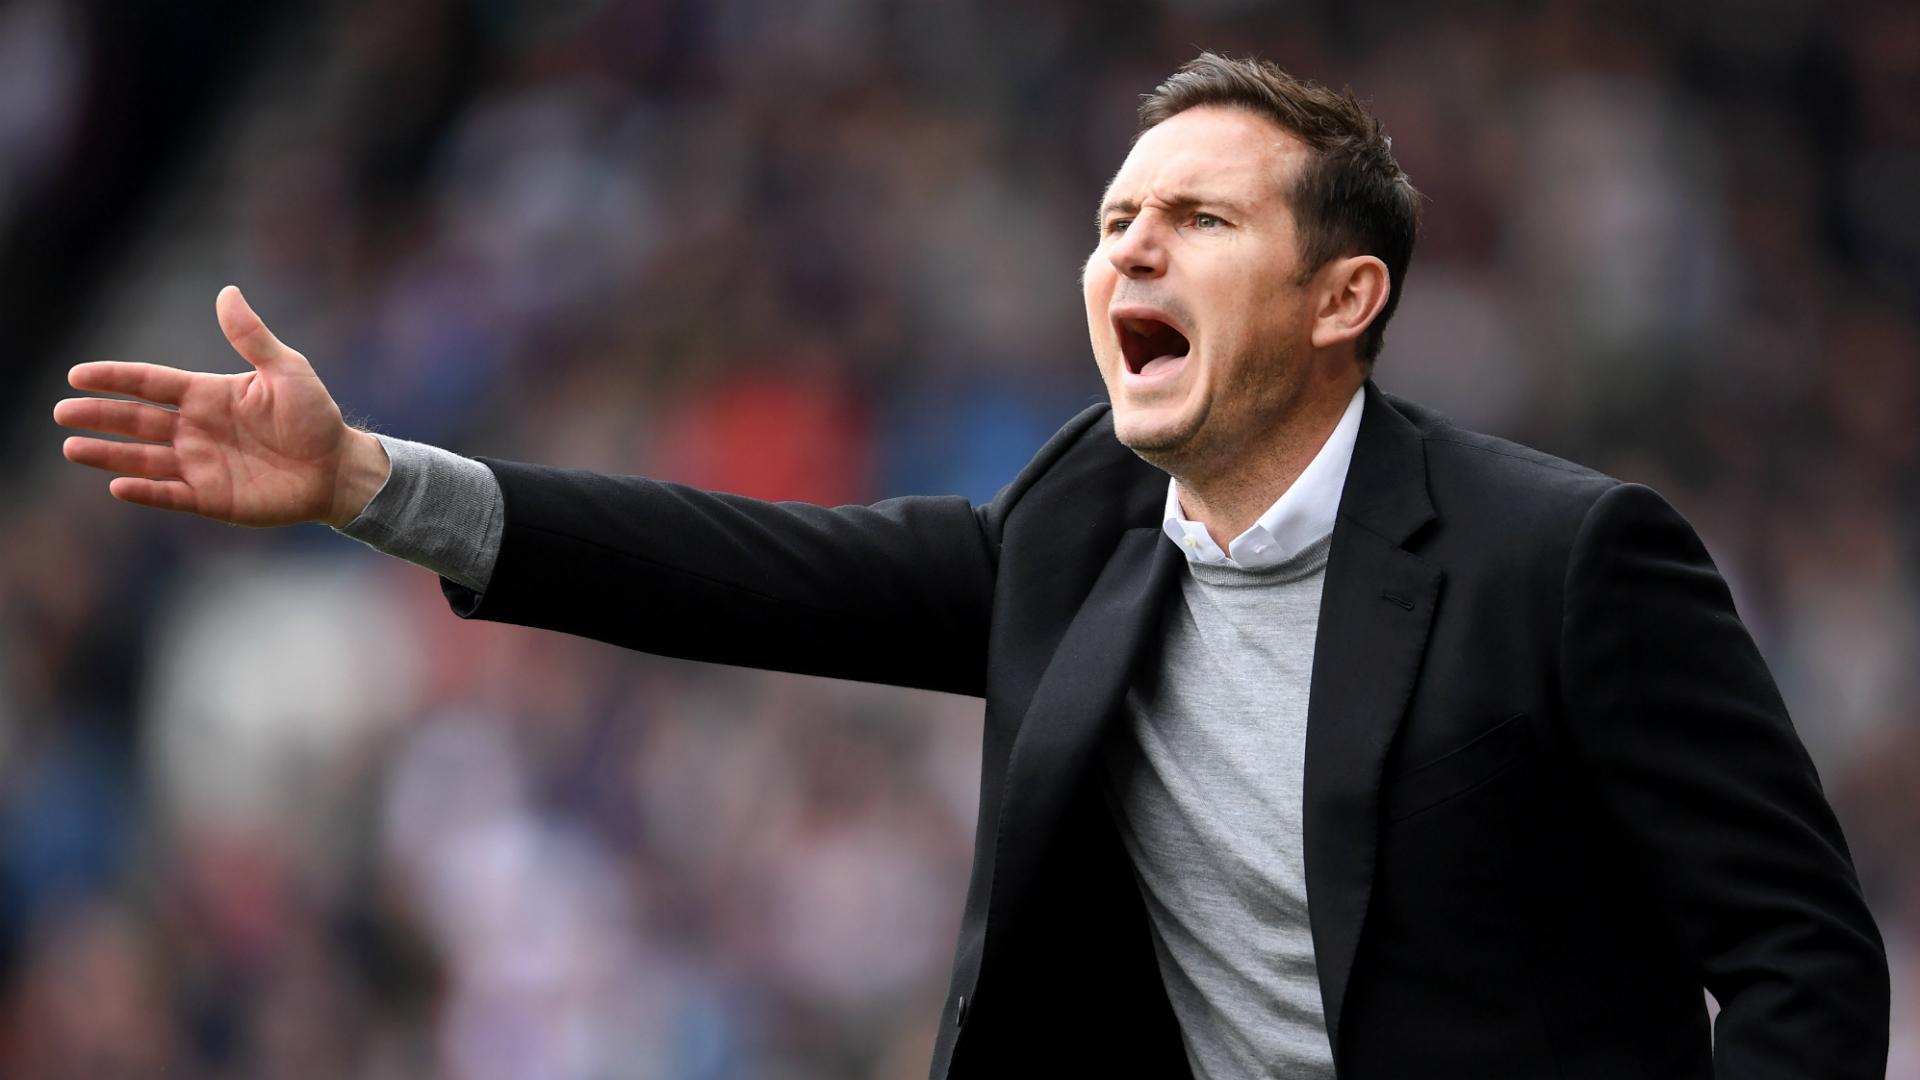 Chelsea legend Frank Lampard returns to Blues as coach, succeeding Maurizio Sarri